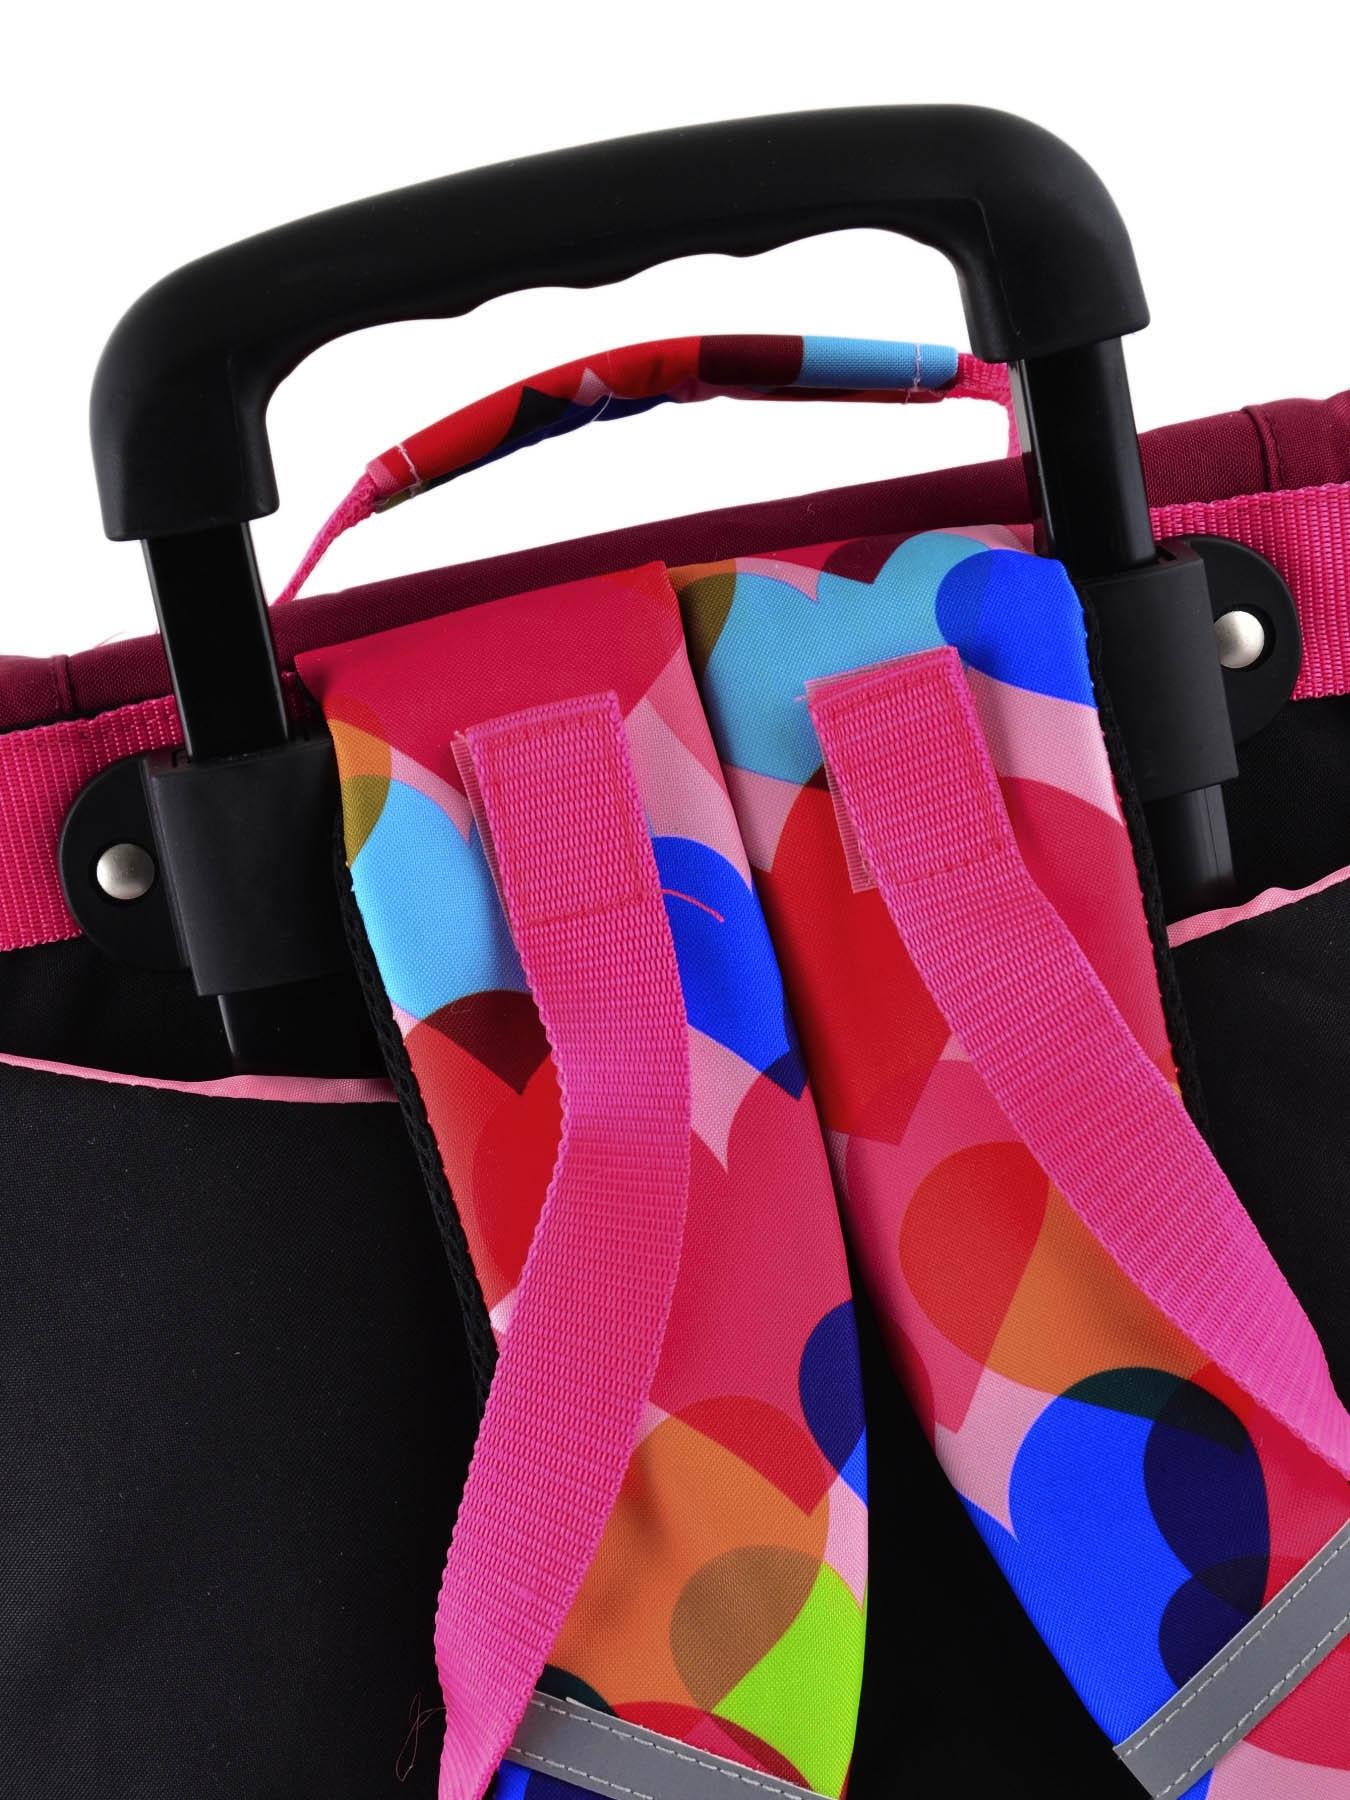 Школьный портфель на колесах Hello Kitty арт. HPS23070R, - фото 6